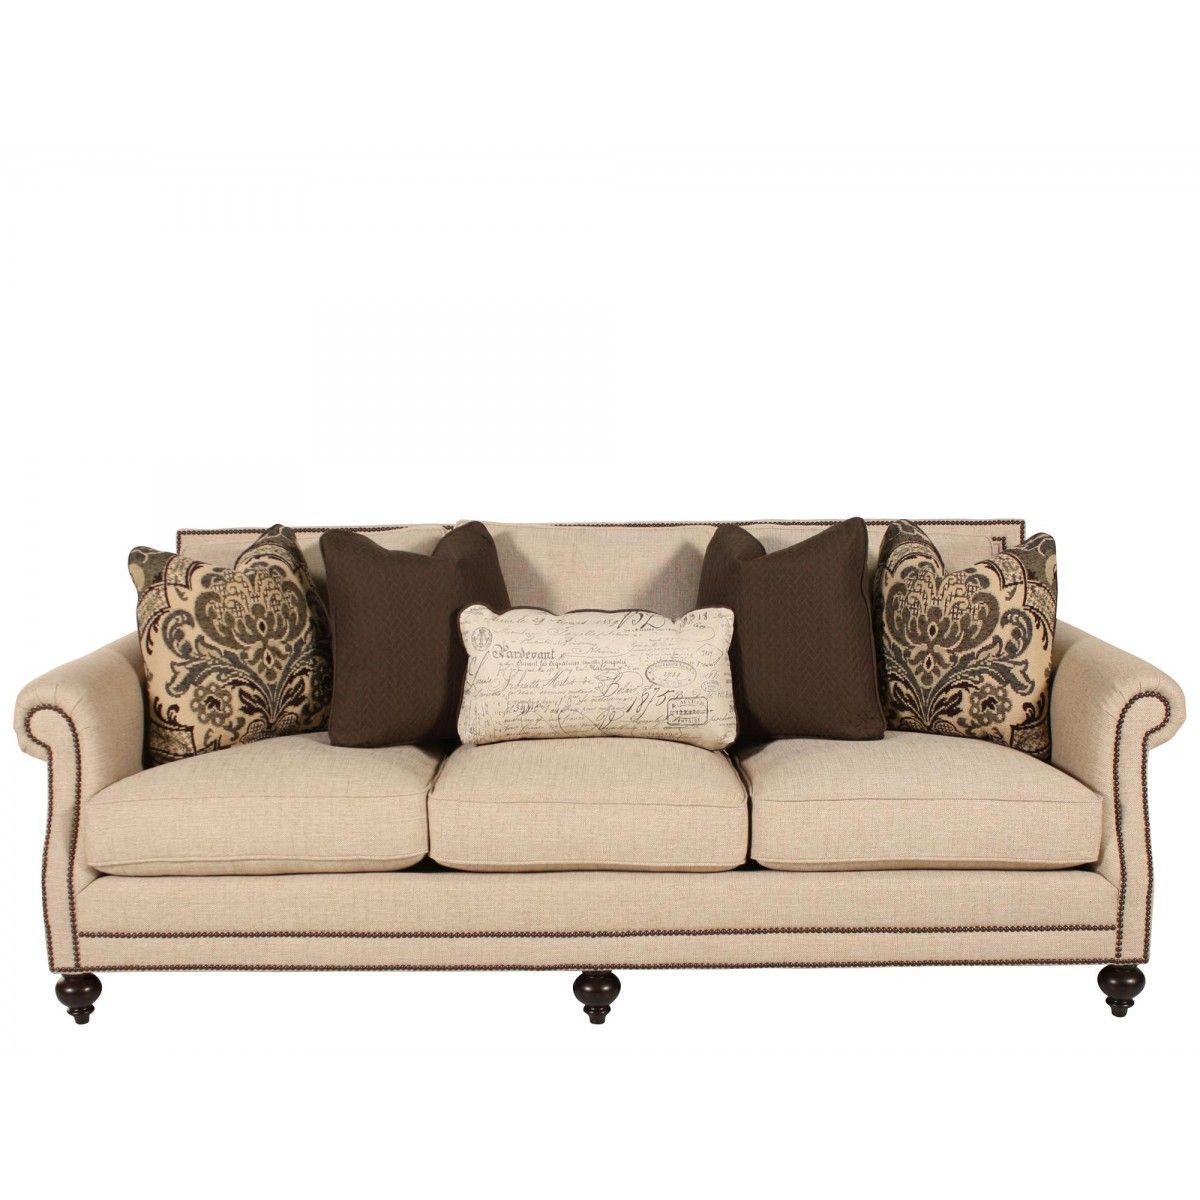 Elegant Looking Bernhardt Sofa Collection Attractive Brae